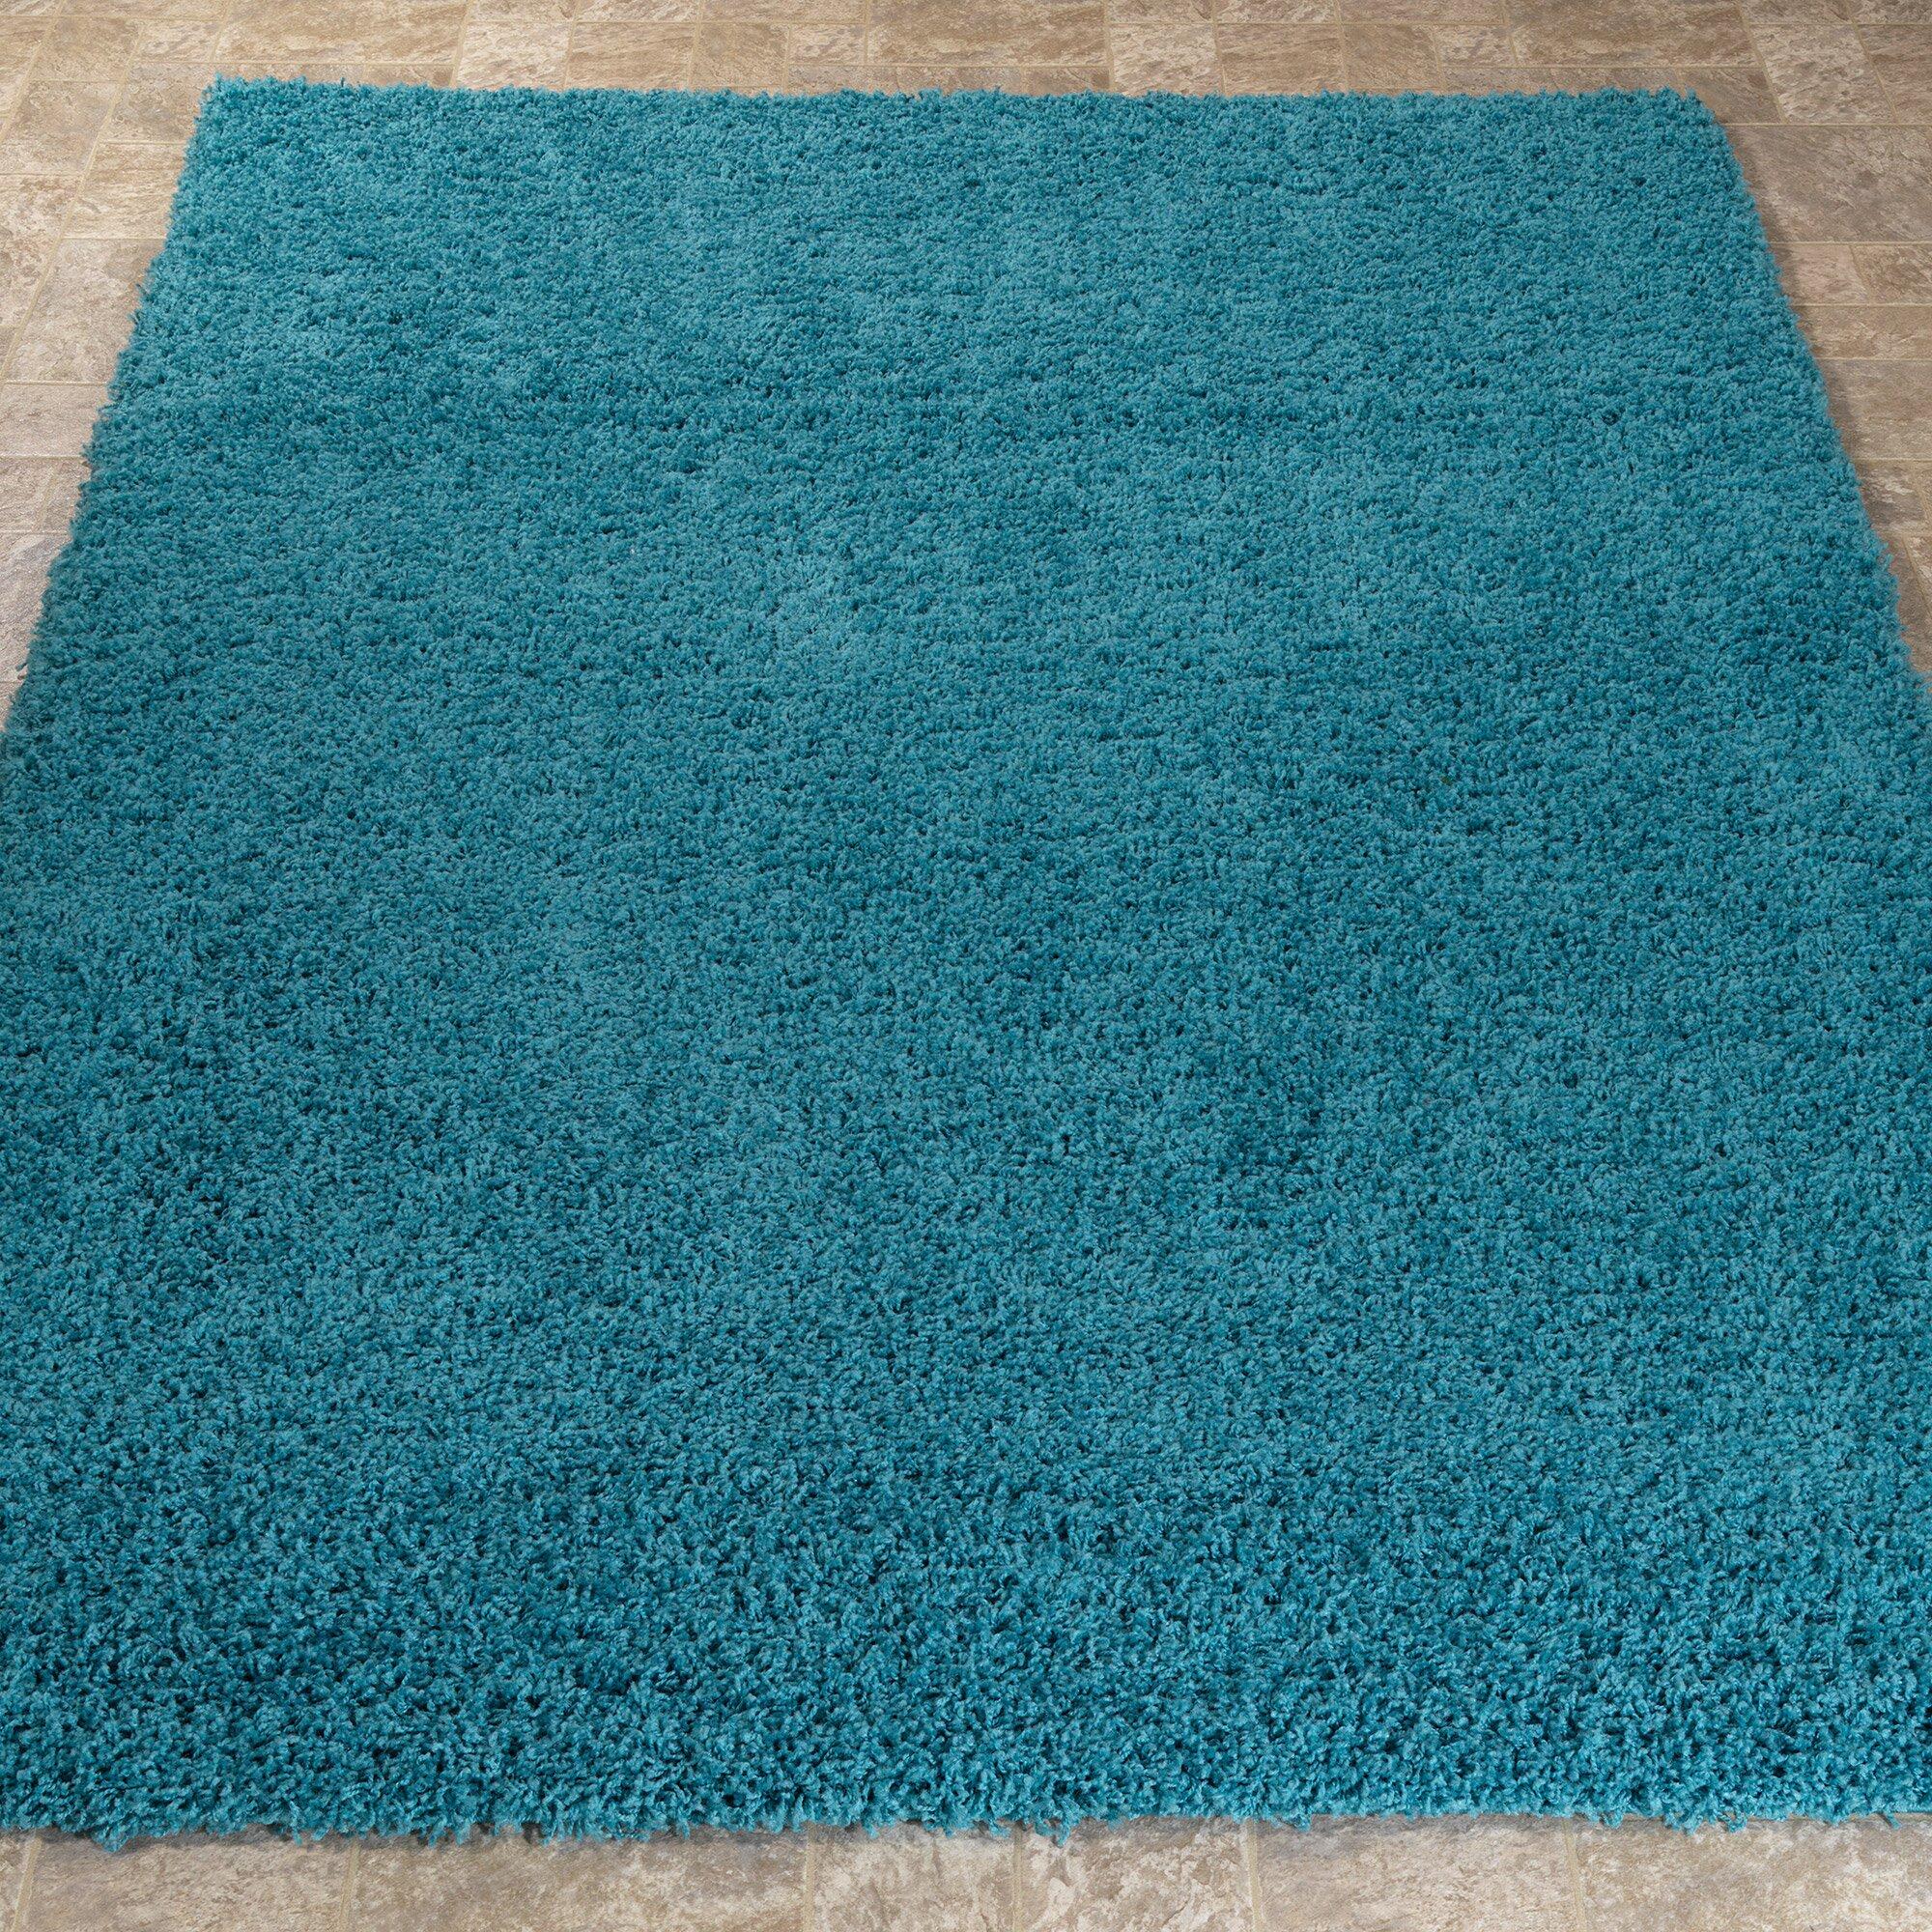 Teal Area Rug Turquoise Rug Soft Rug Bathroom By: Ottomanson Turquoise Blue Shaggy Area Rug & Reviews